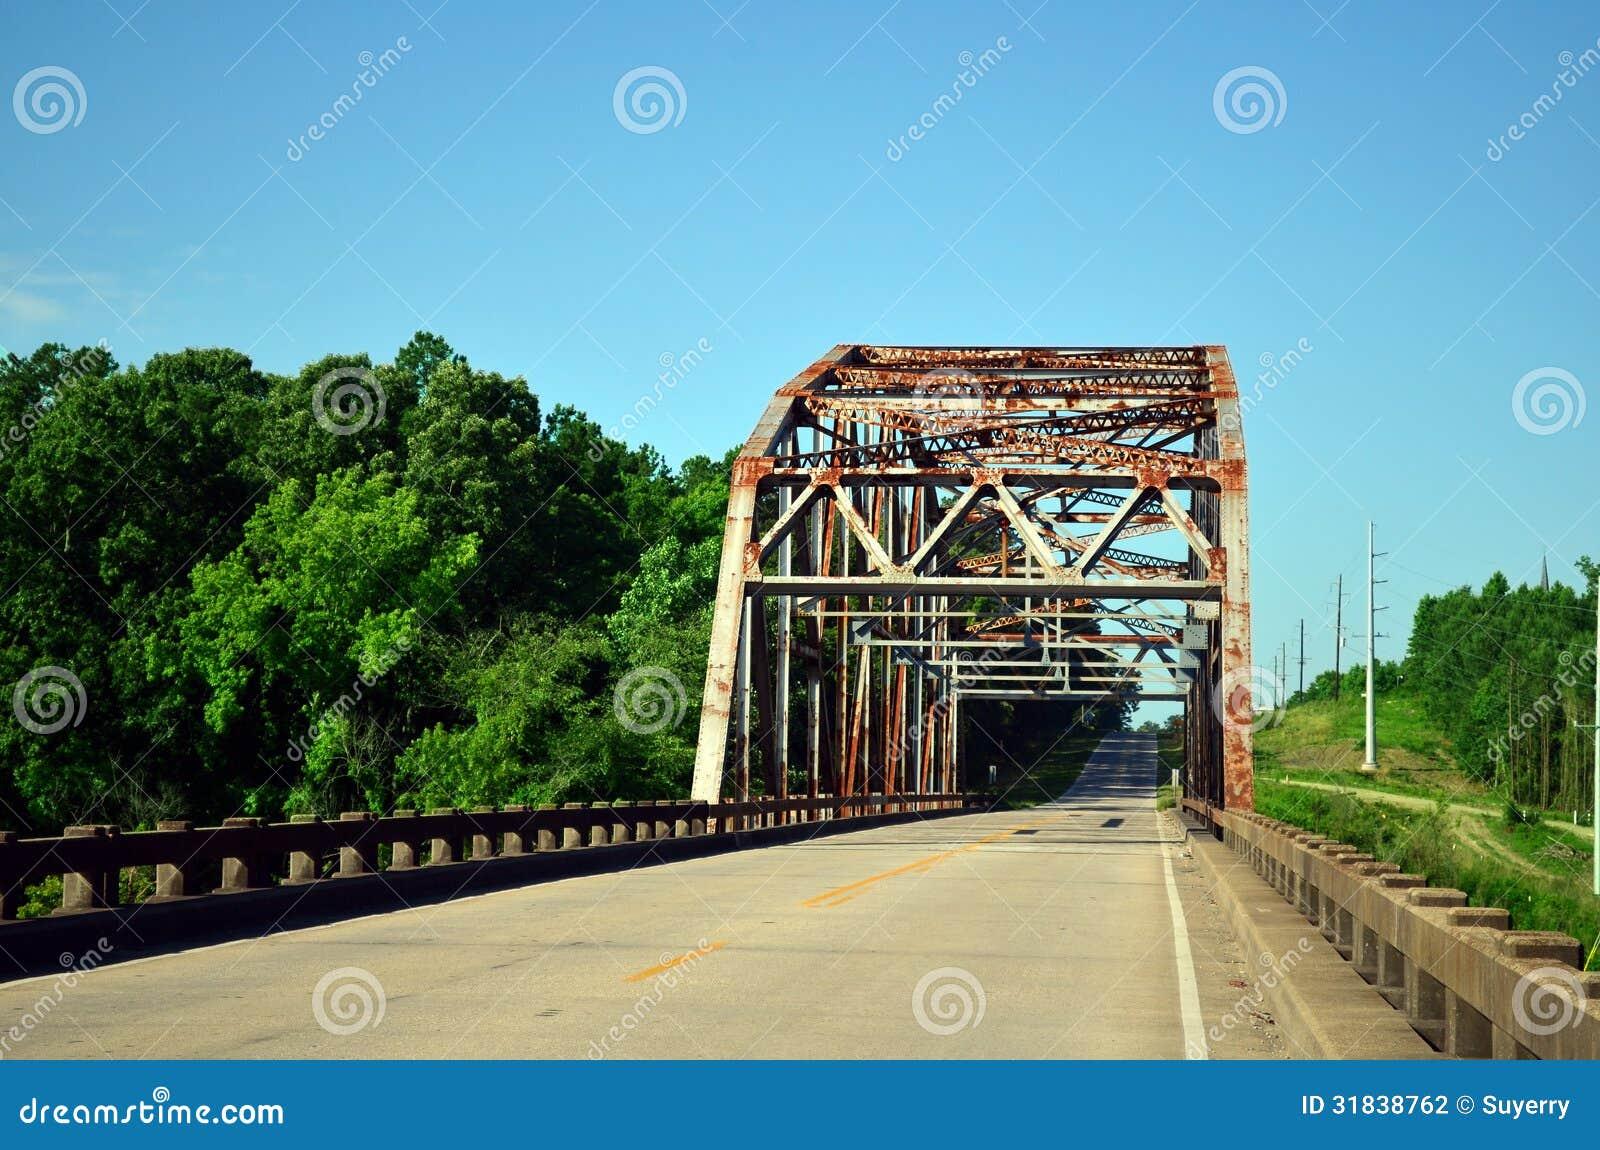 Metal Covered Bridges : Rusty steel truss covered bridge stock photography image